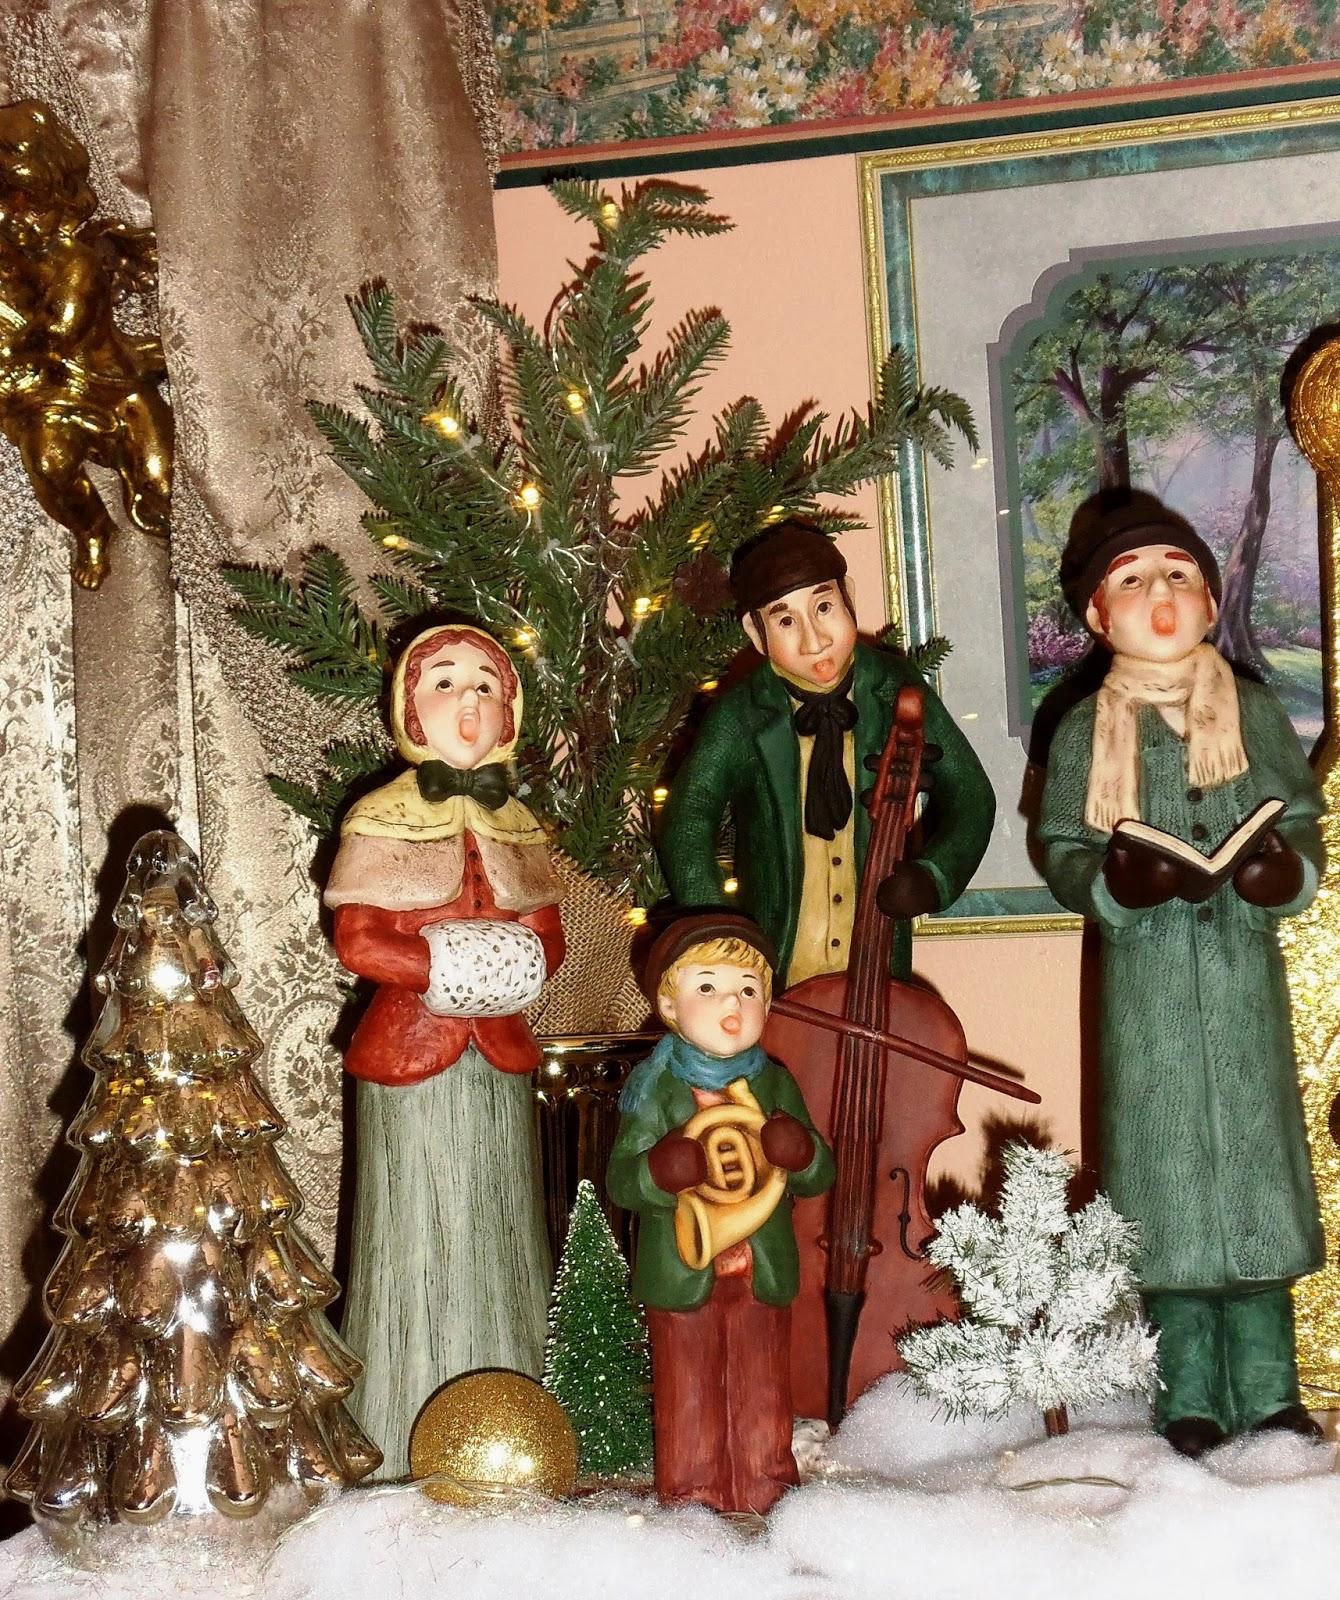 Sams Christmas Trees: A DEBBIE-DABBLE CHRISTMAS: Christmas In The Living Room